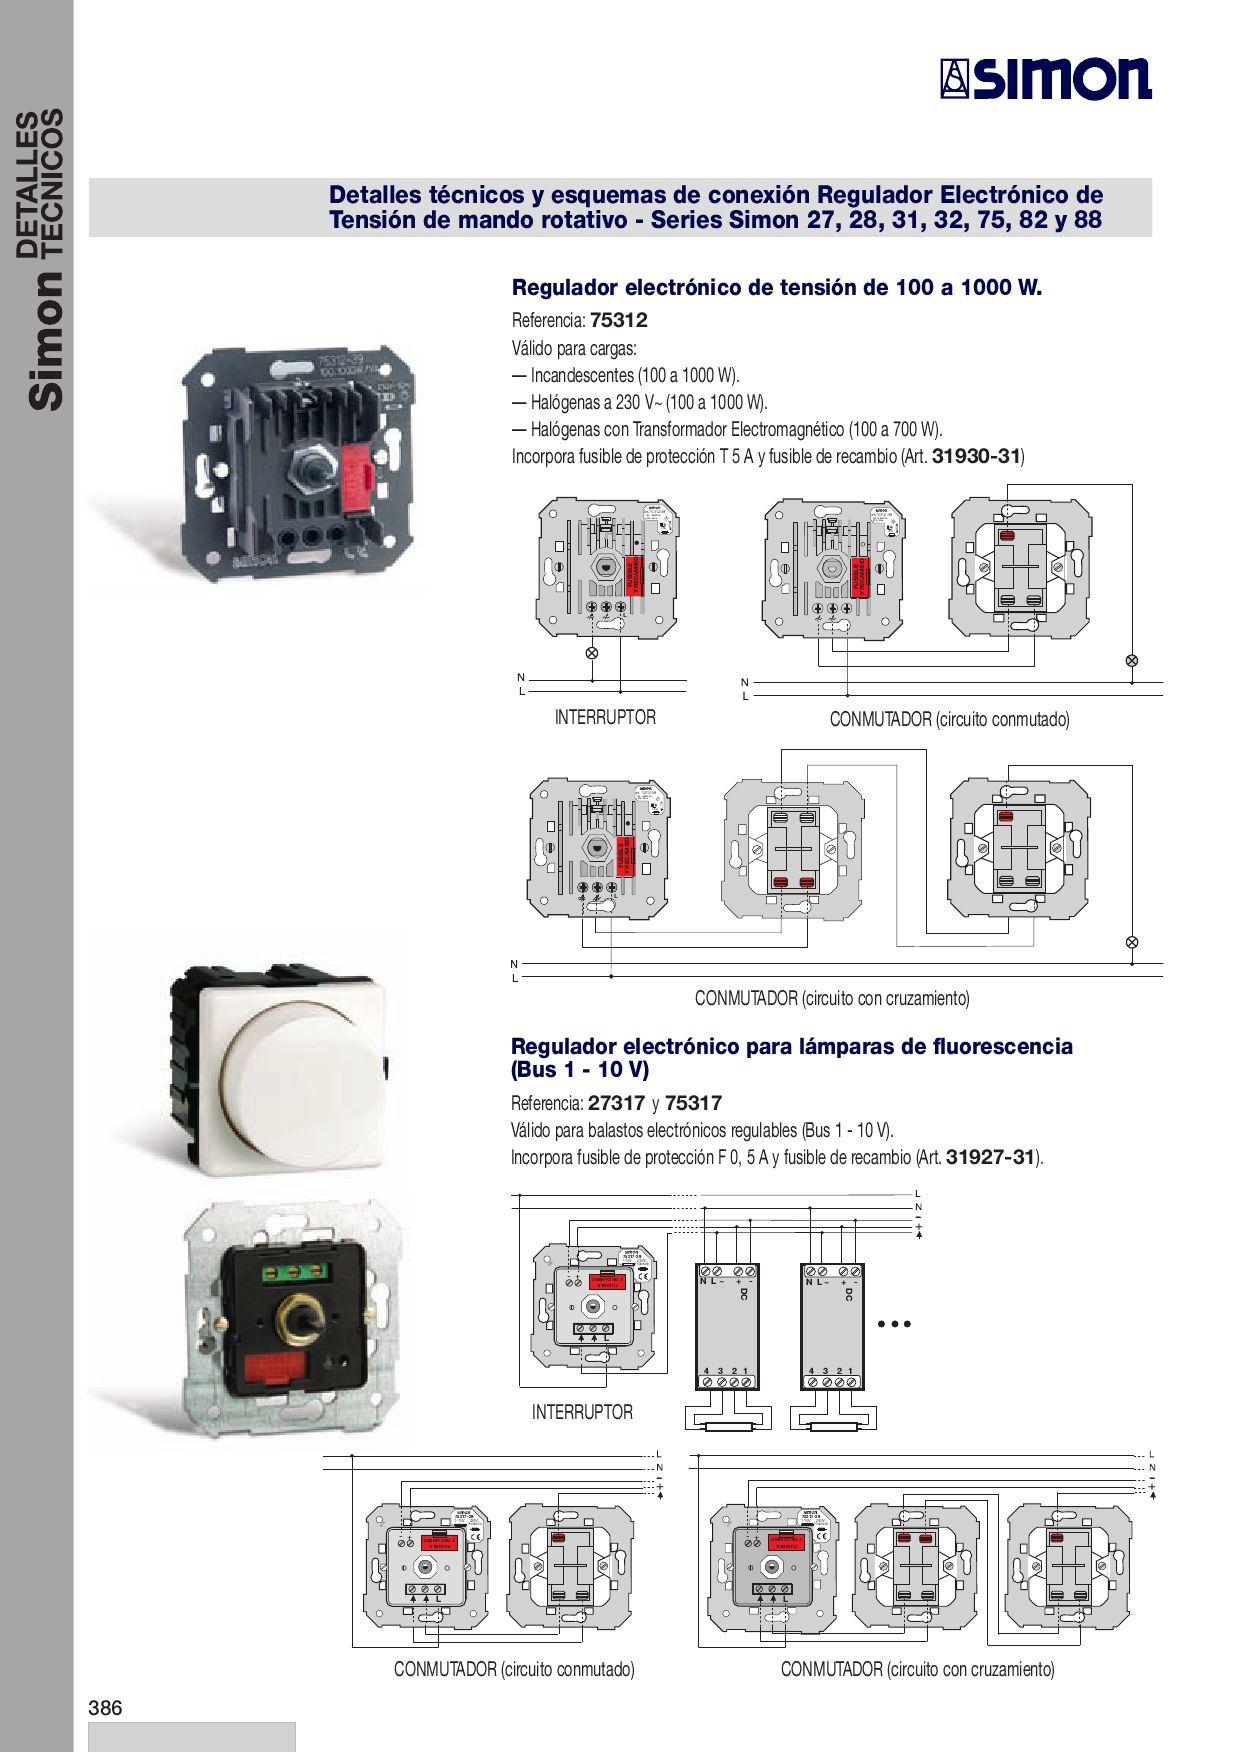 Detalles tecnicos simon by mariano sanz issuu - Interruptores simon 75 ...